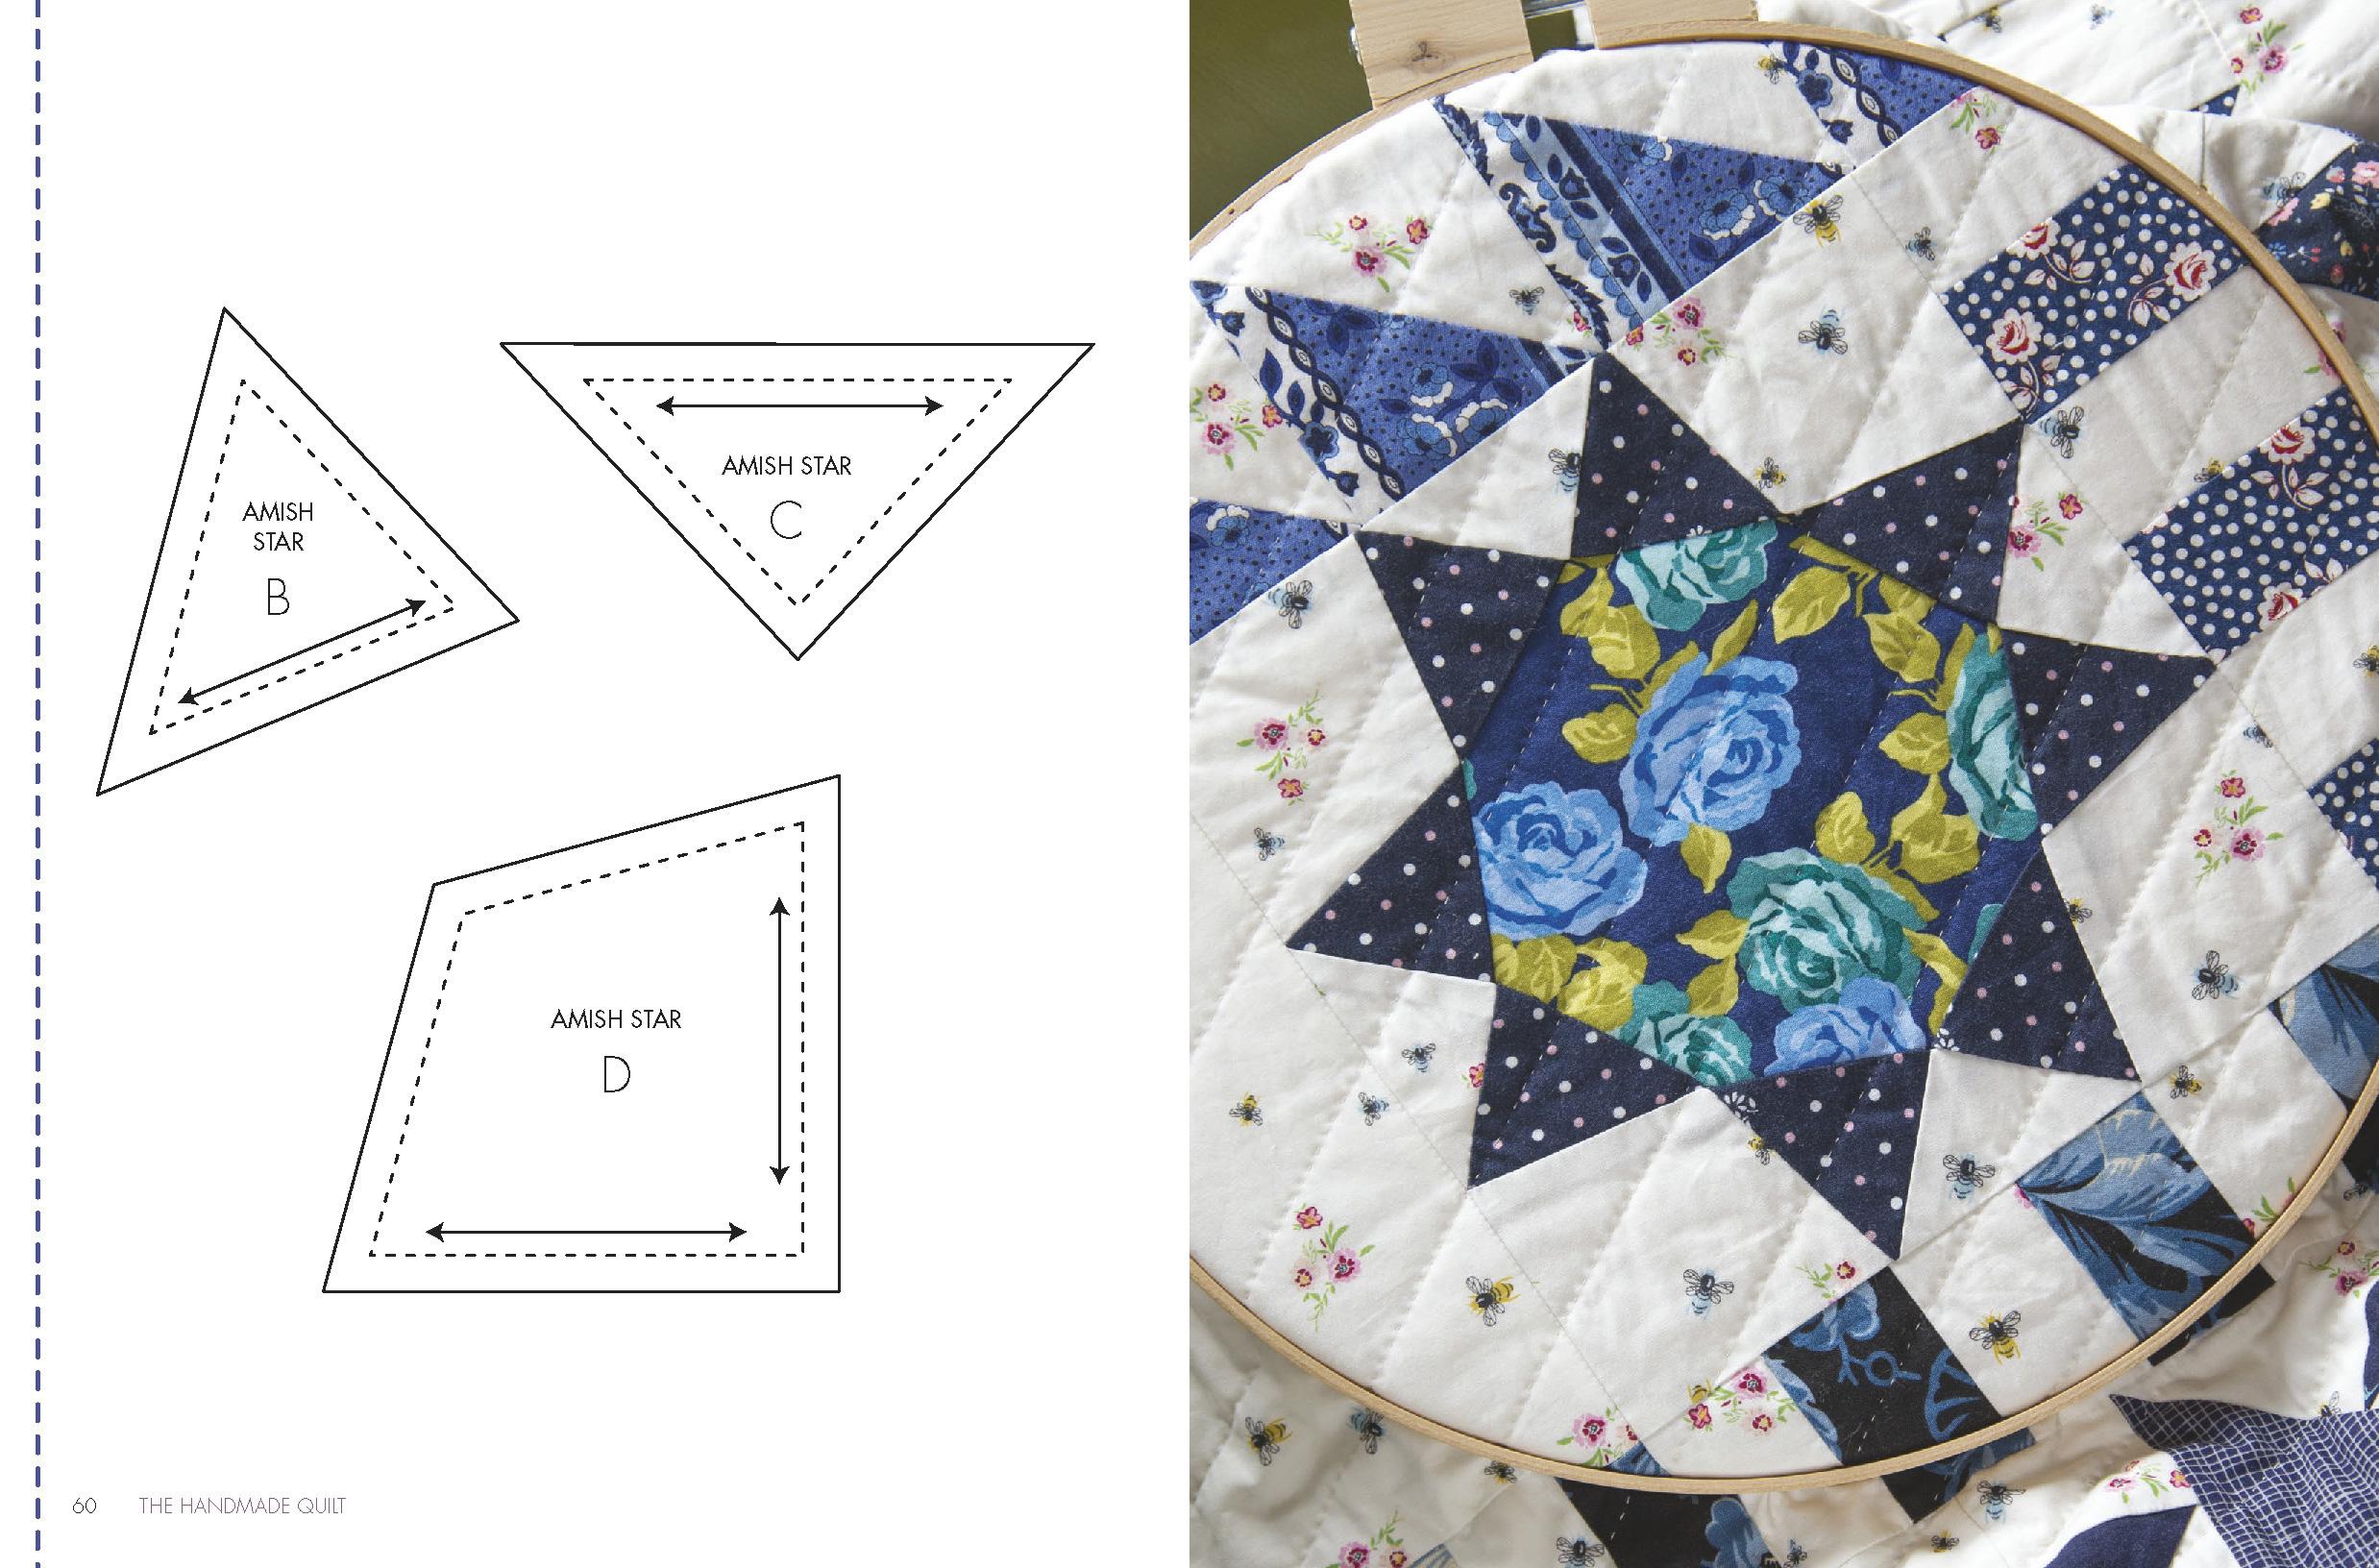 The Handmade Quilt